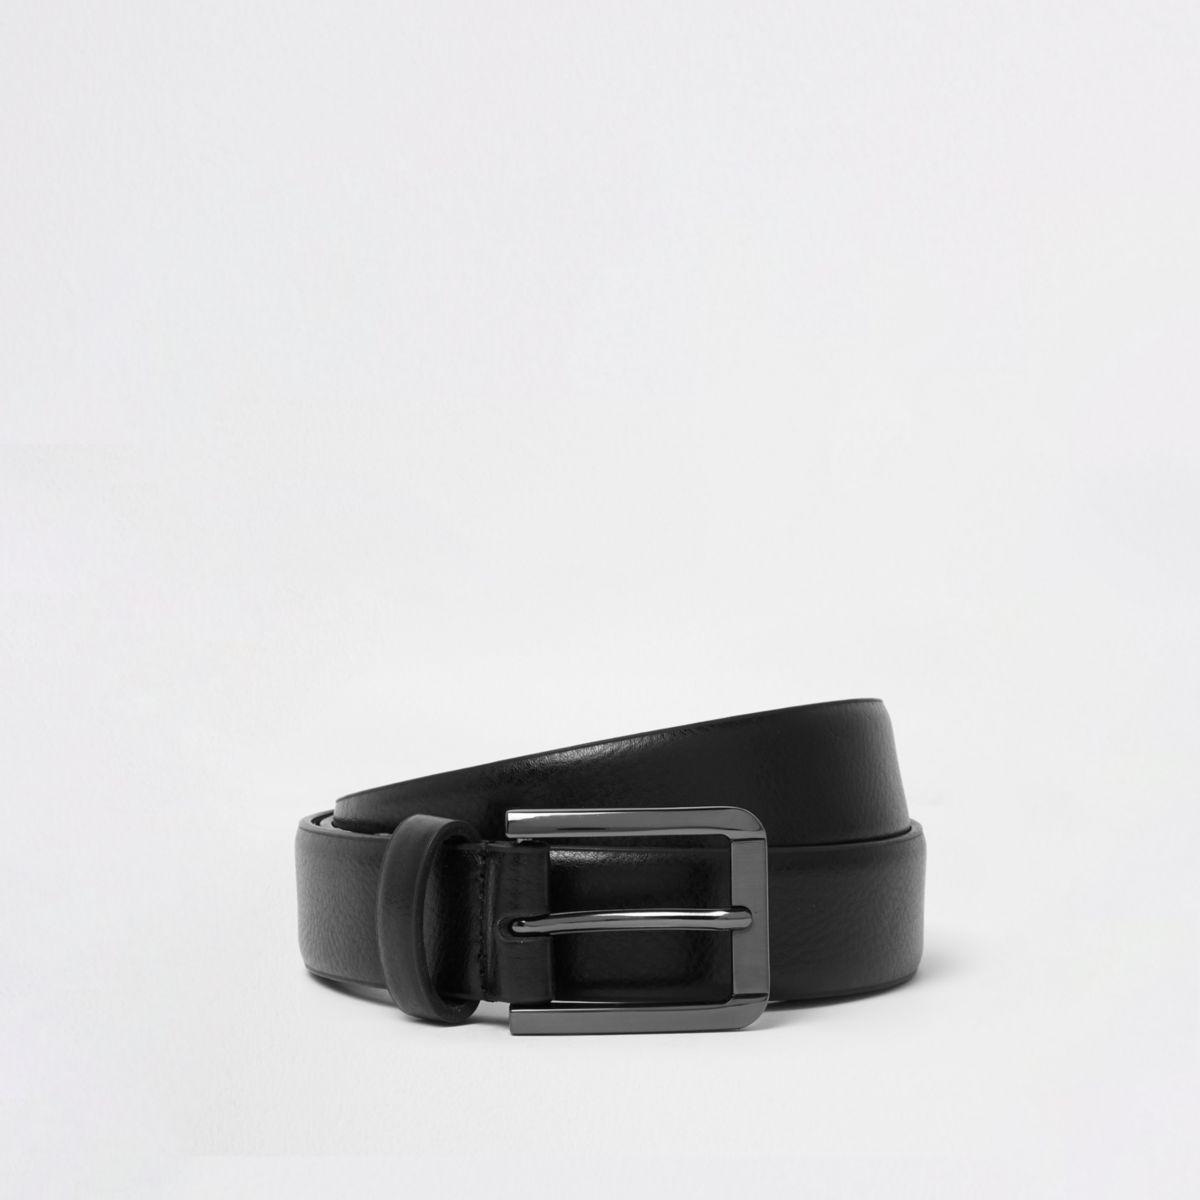 Schwarzer eleganter Gürtel